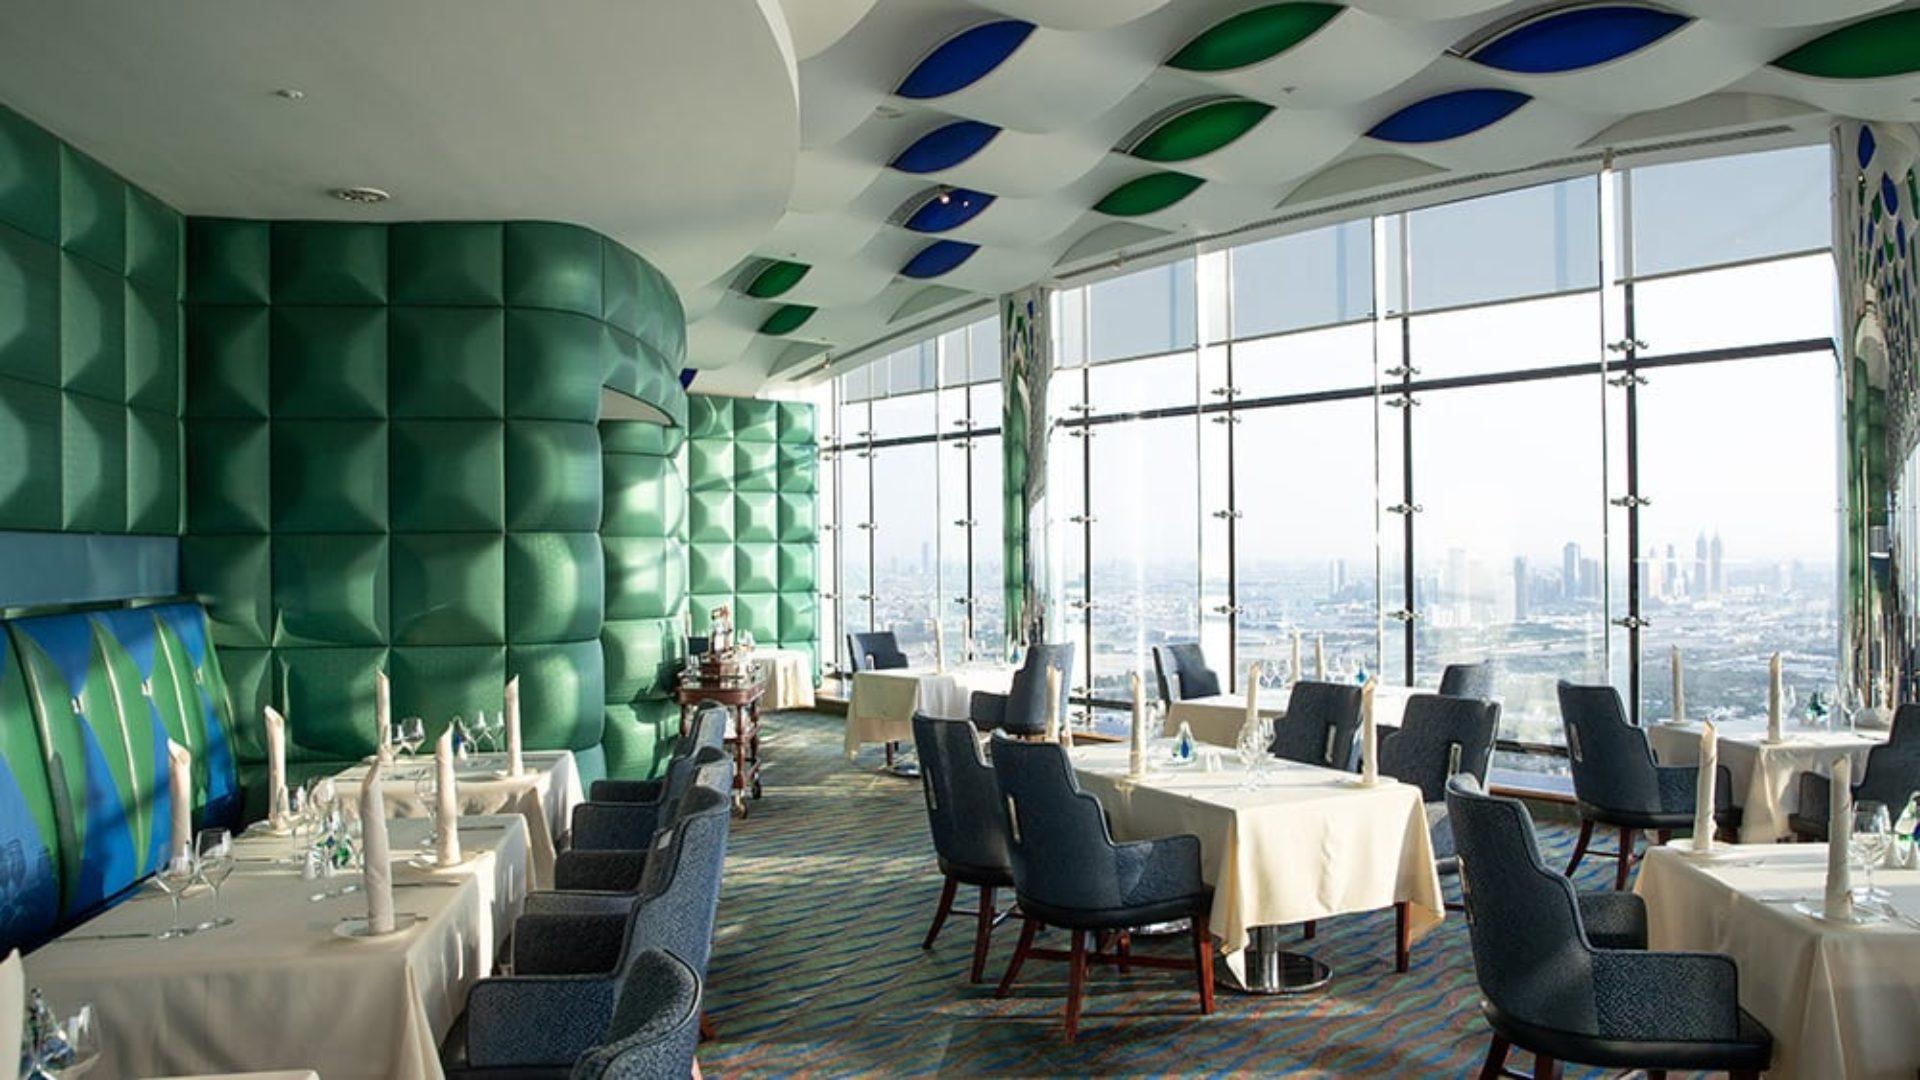 Al Muntaha Restaurant with a sea view at the Burj Al Arab